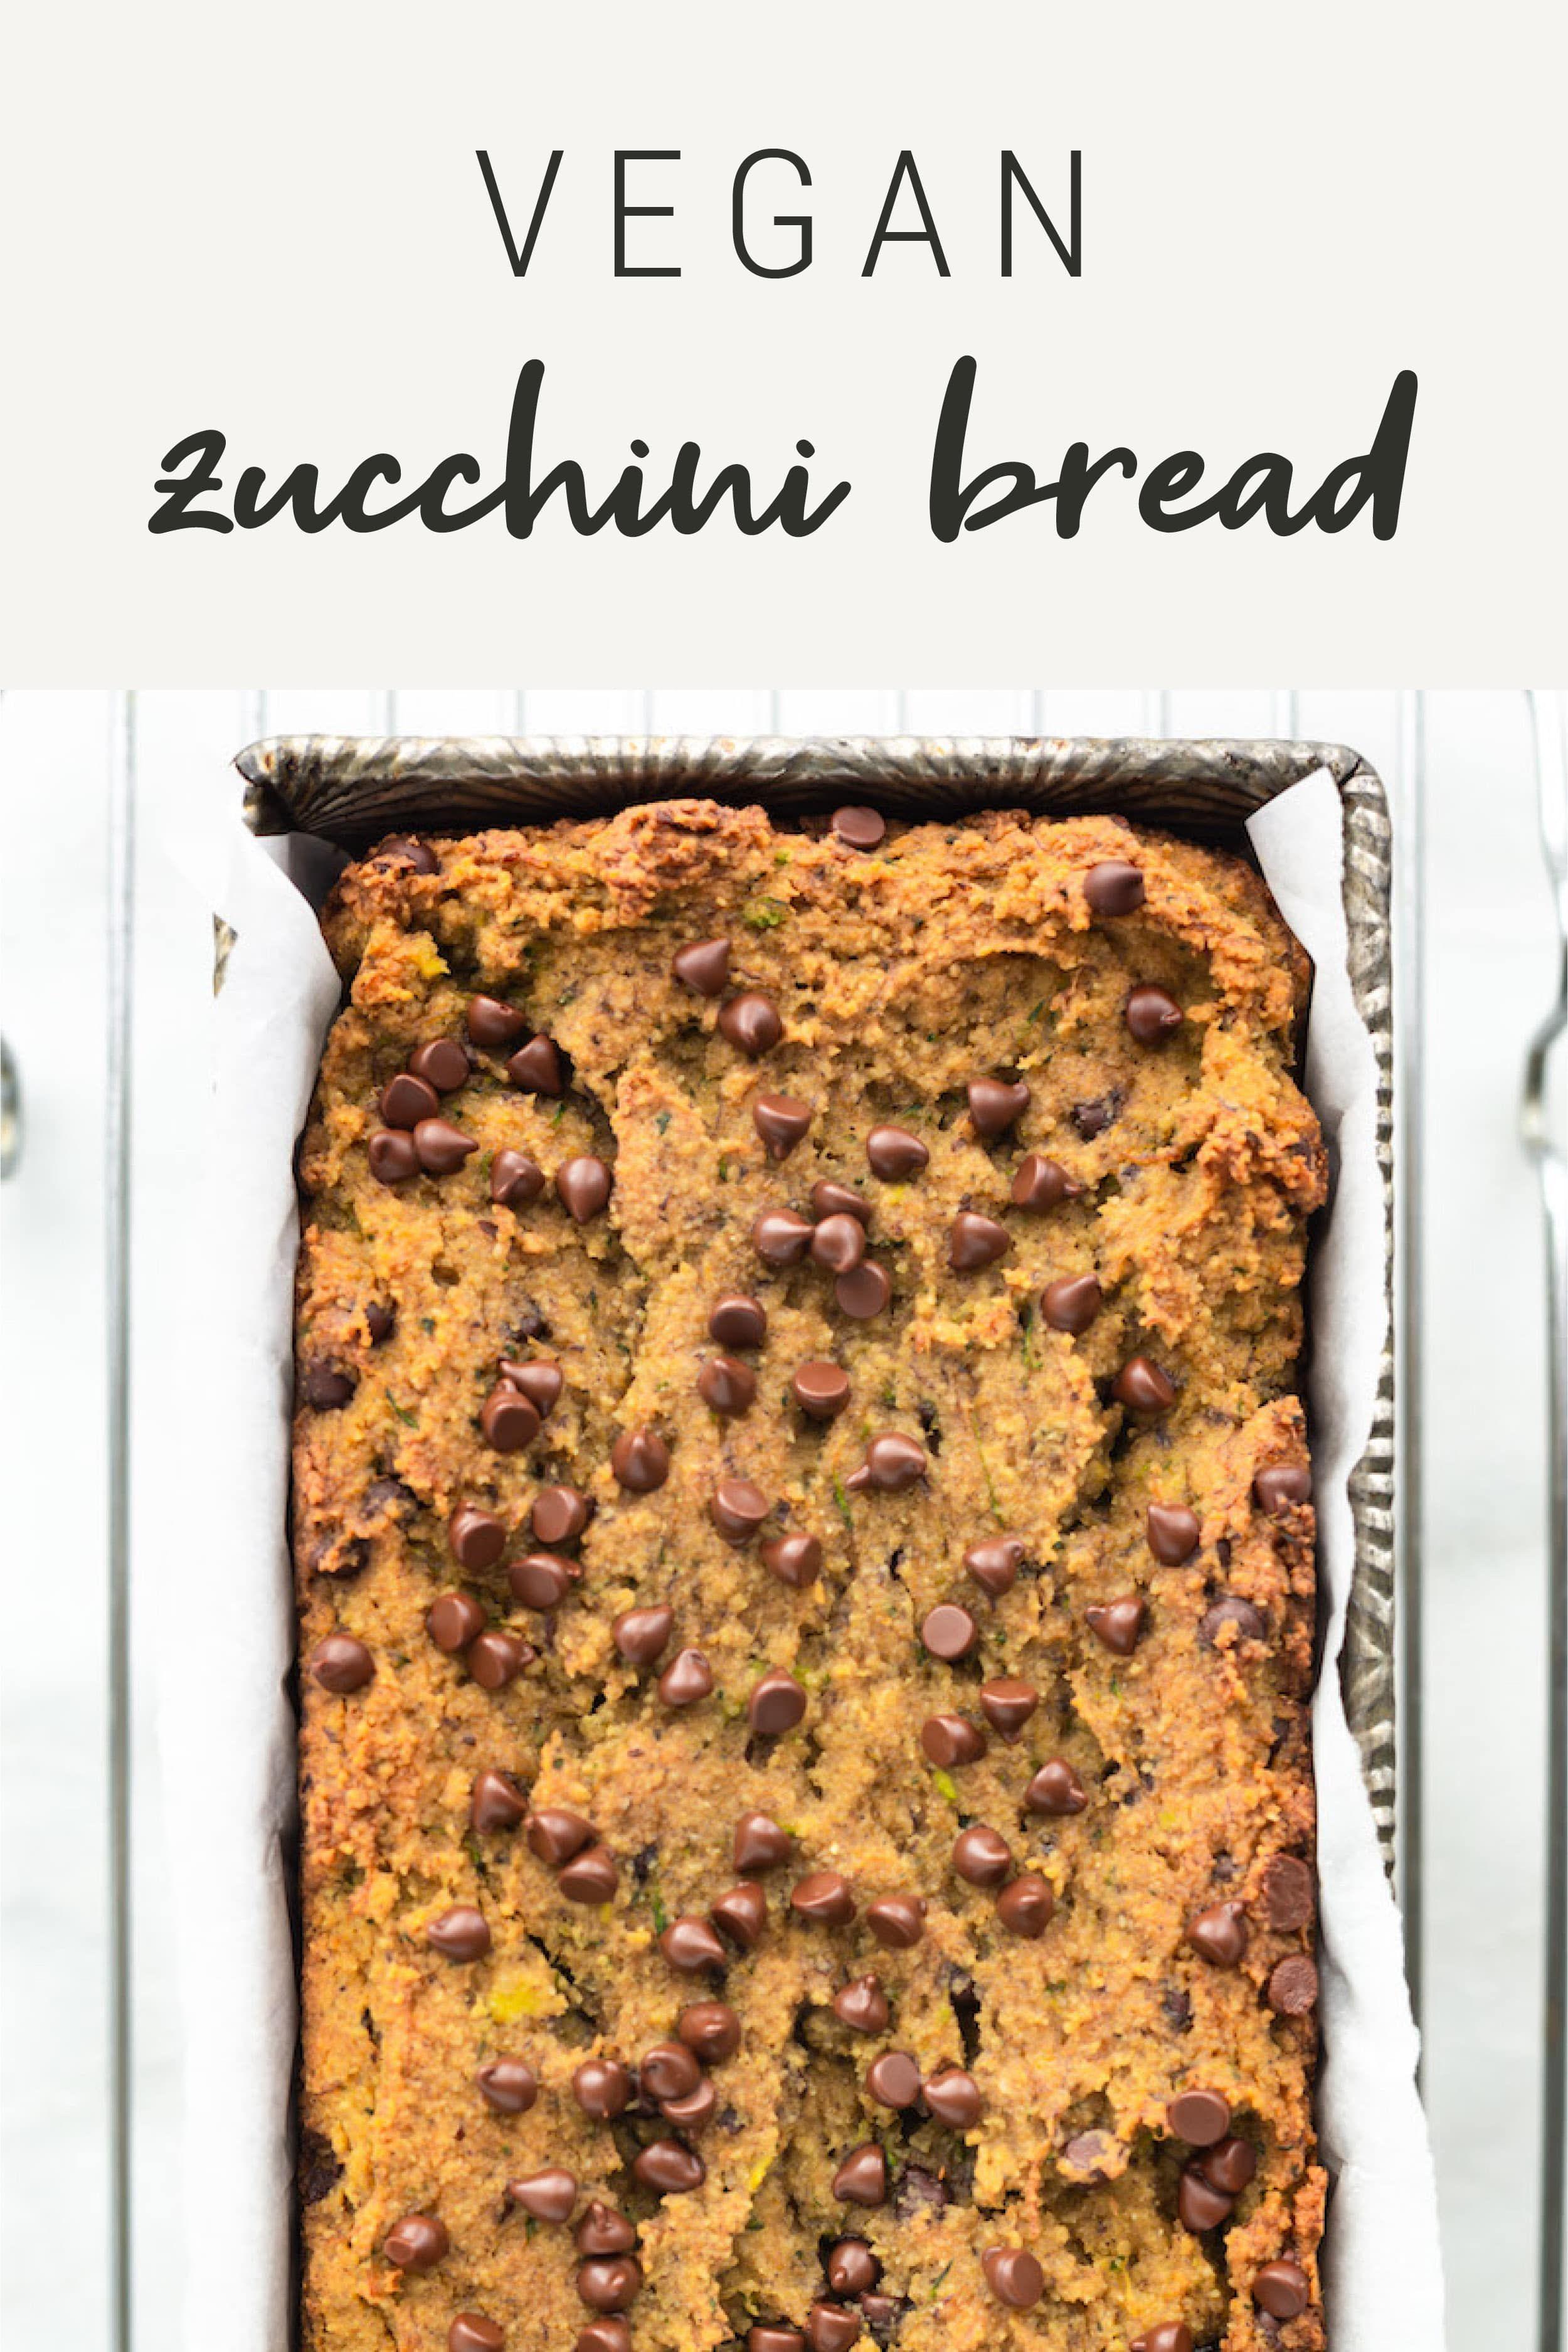 Vegan Zucchini Bread Shane Simple In 2020 Vegan Zucchini Bread Vegan Zucchini Zucchini Bread